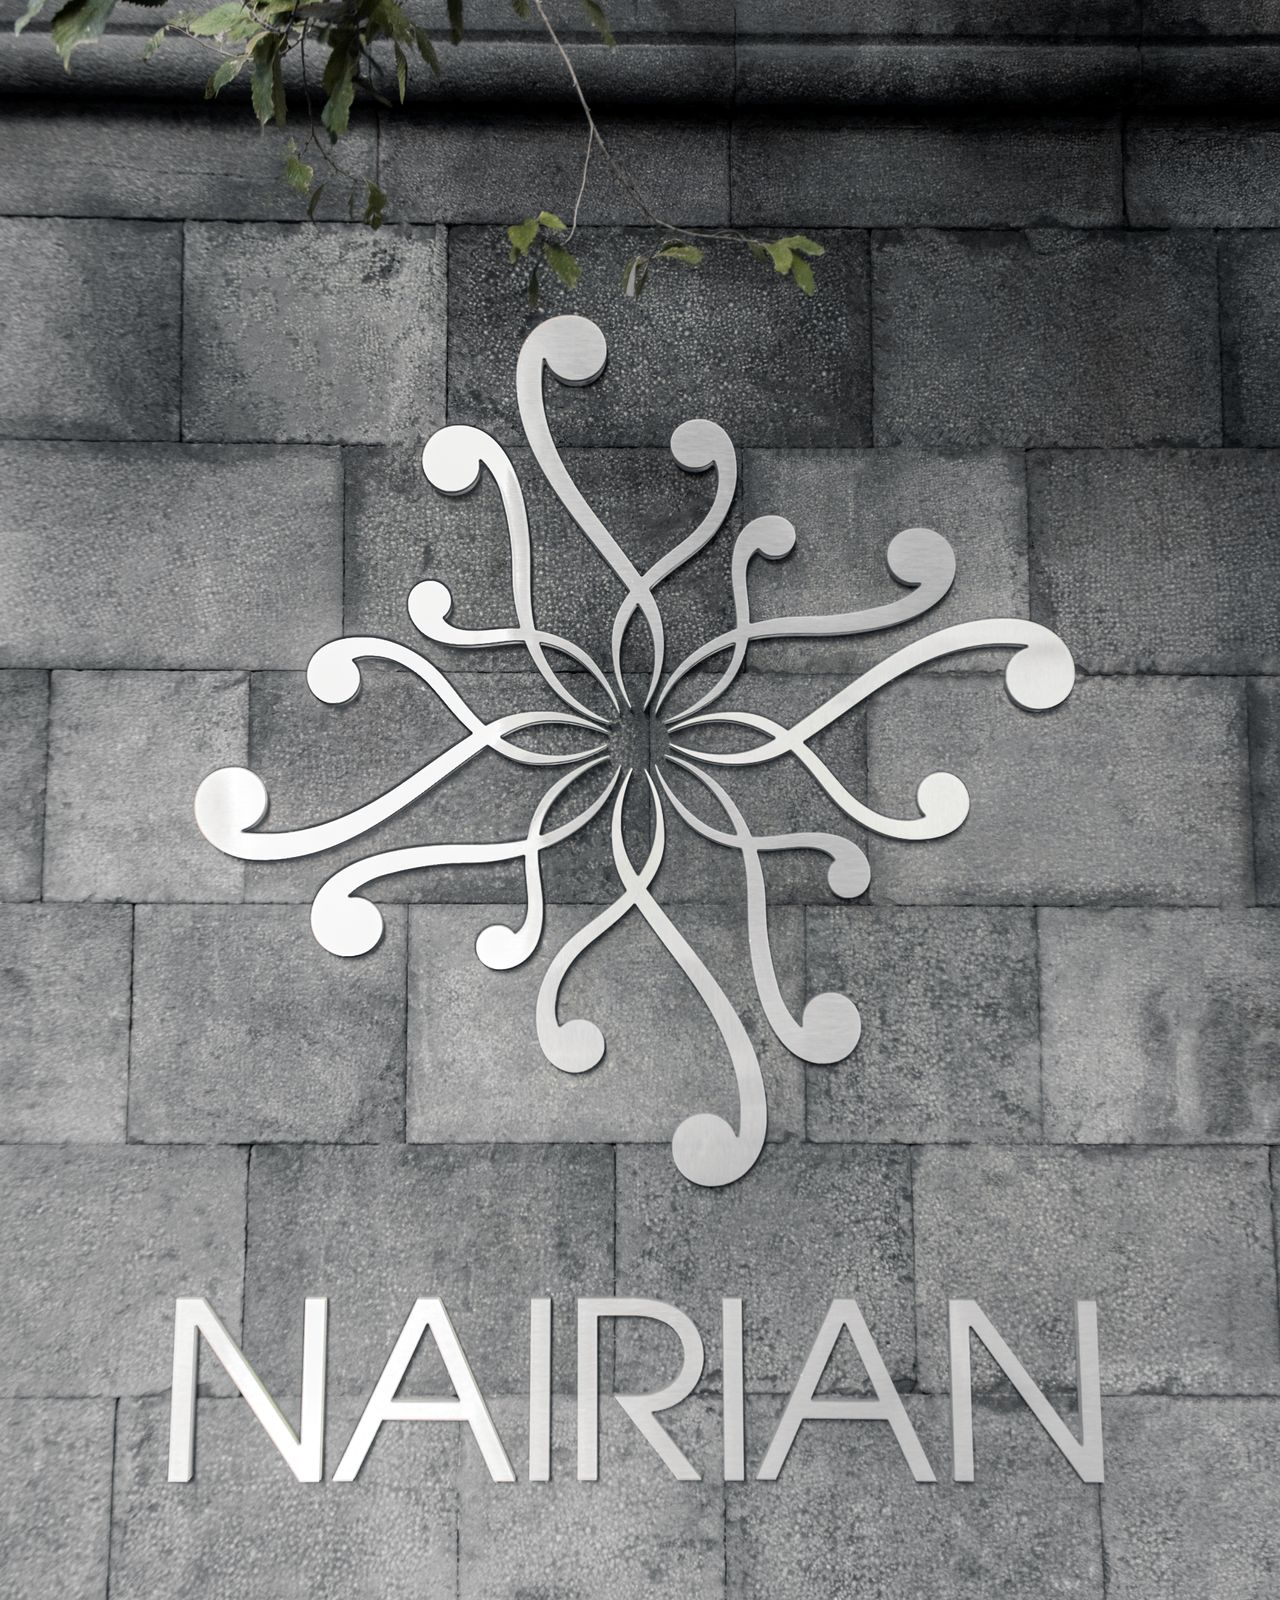 artaqin alyuminic logo nshan